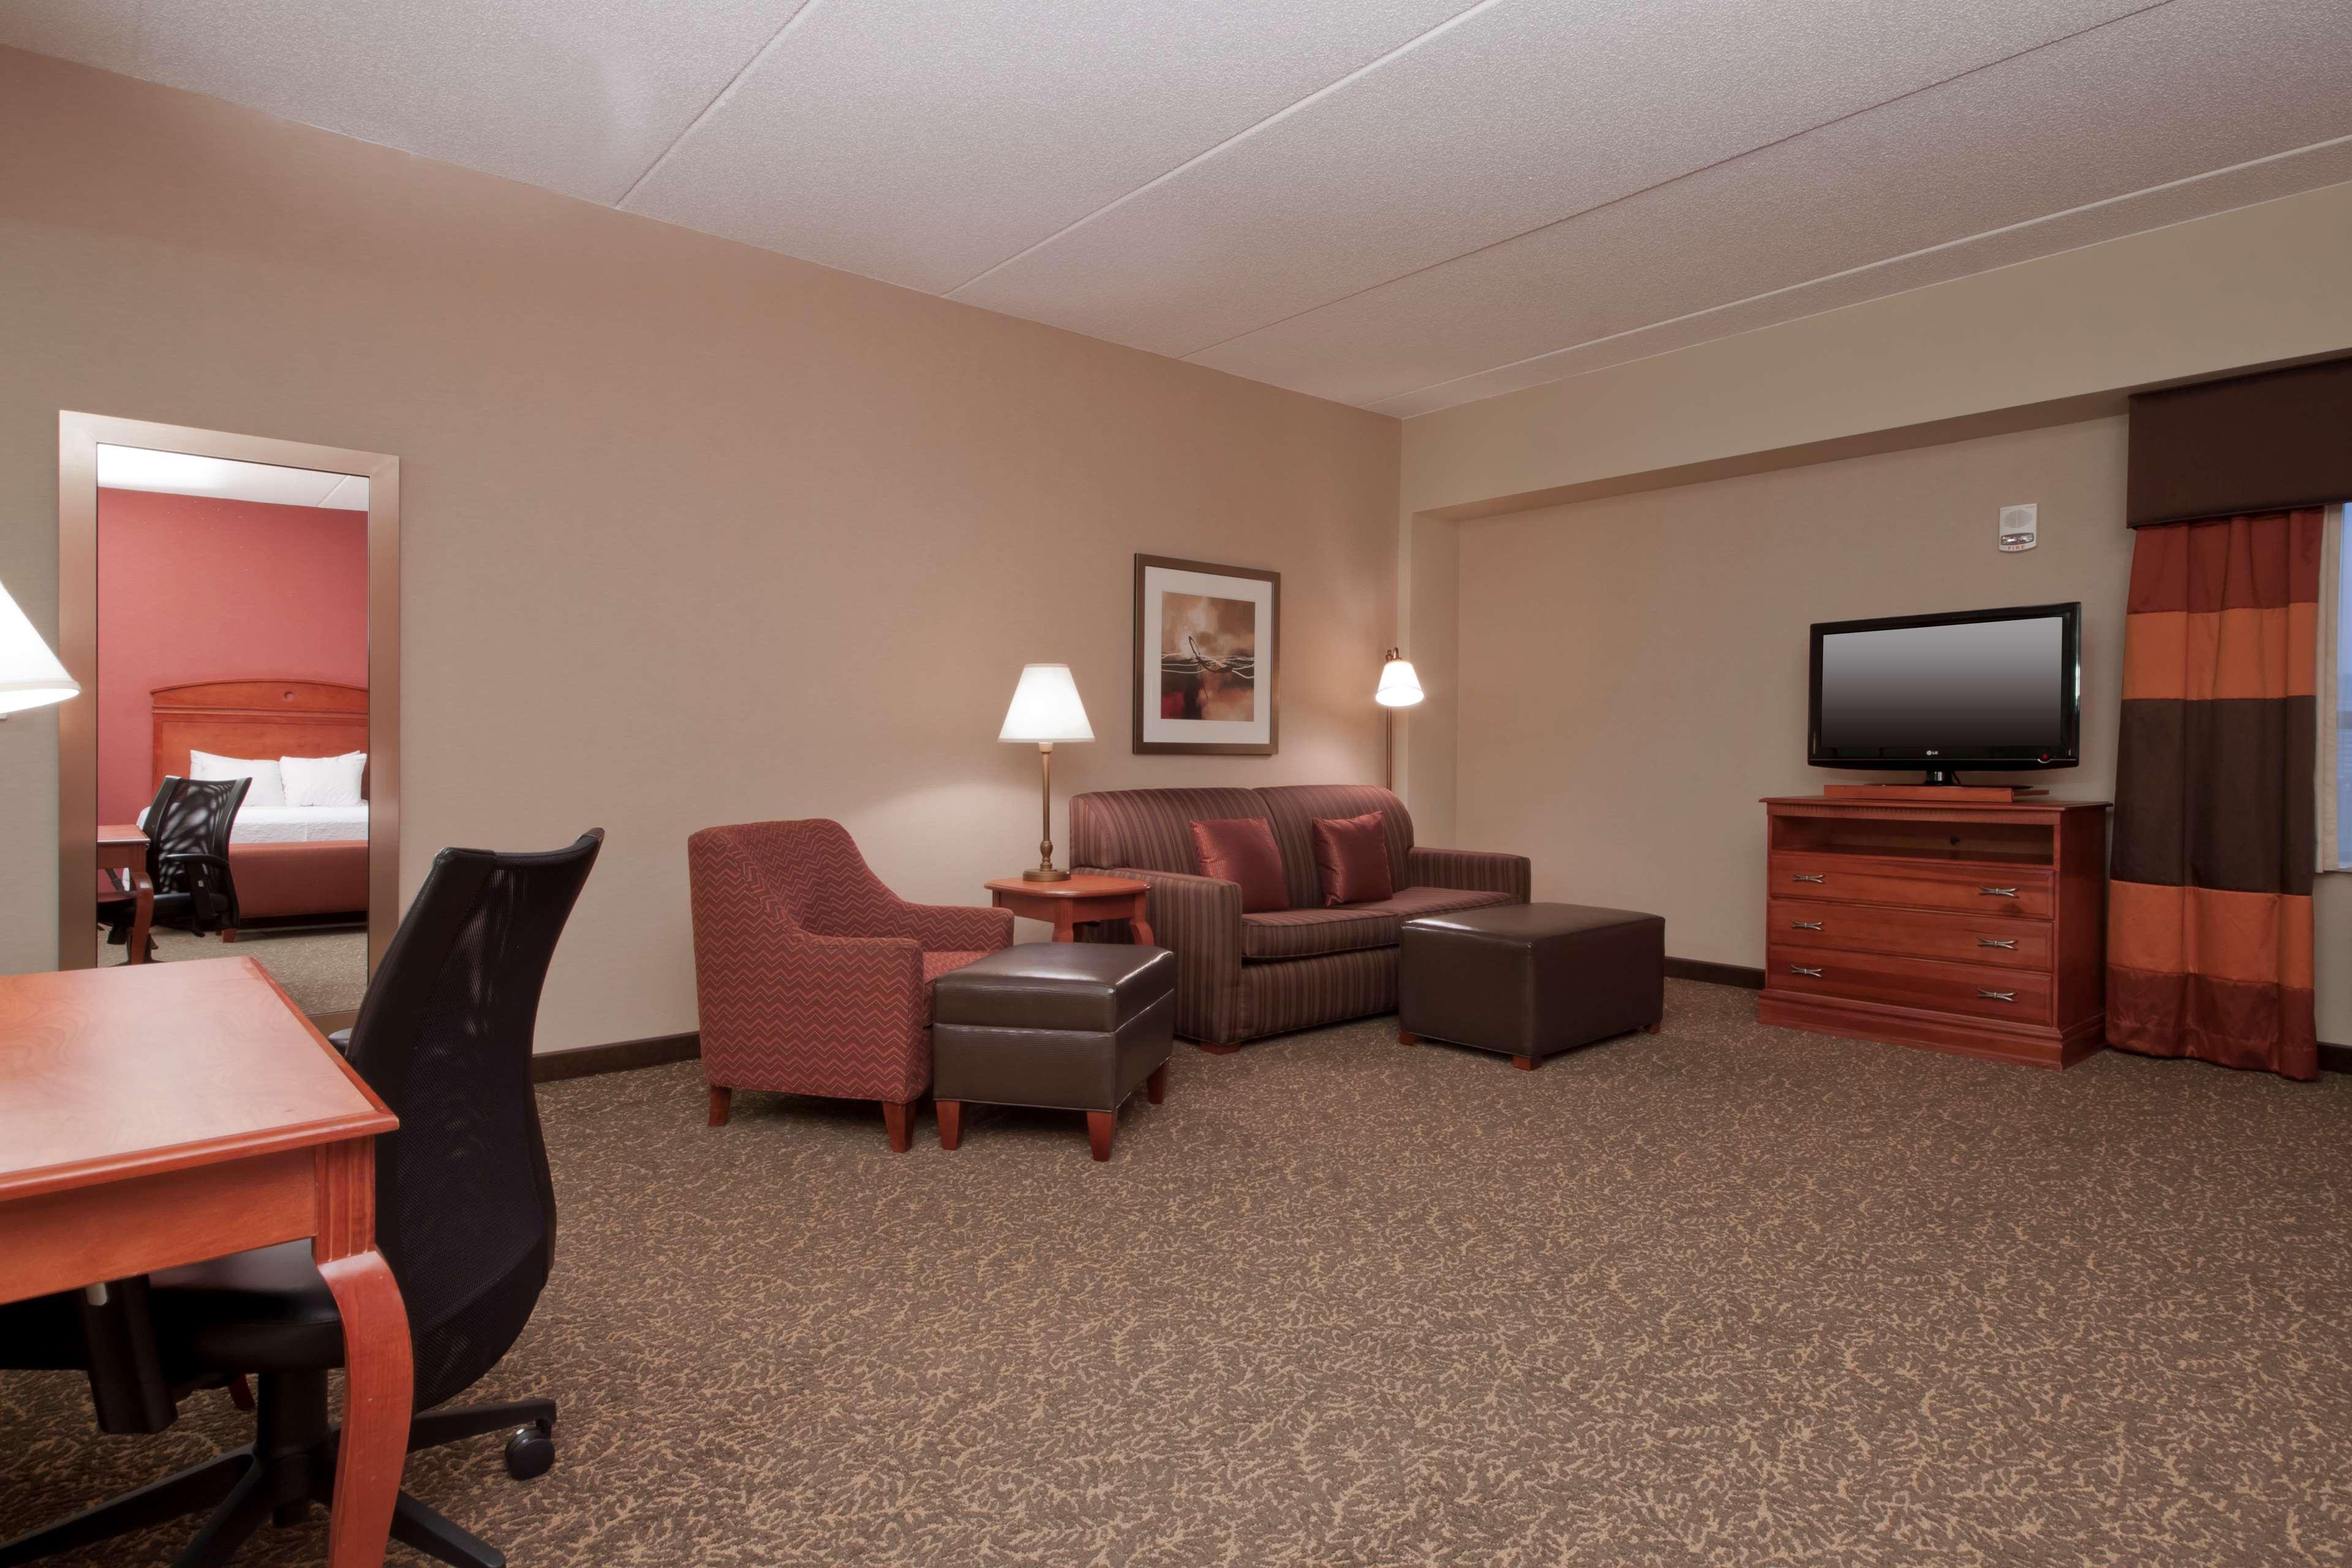 Hampton Inn & Suites Pittsburgh-Downtown image 23